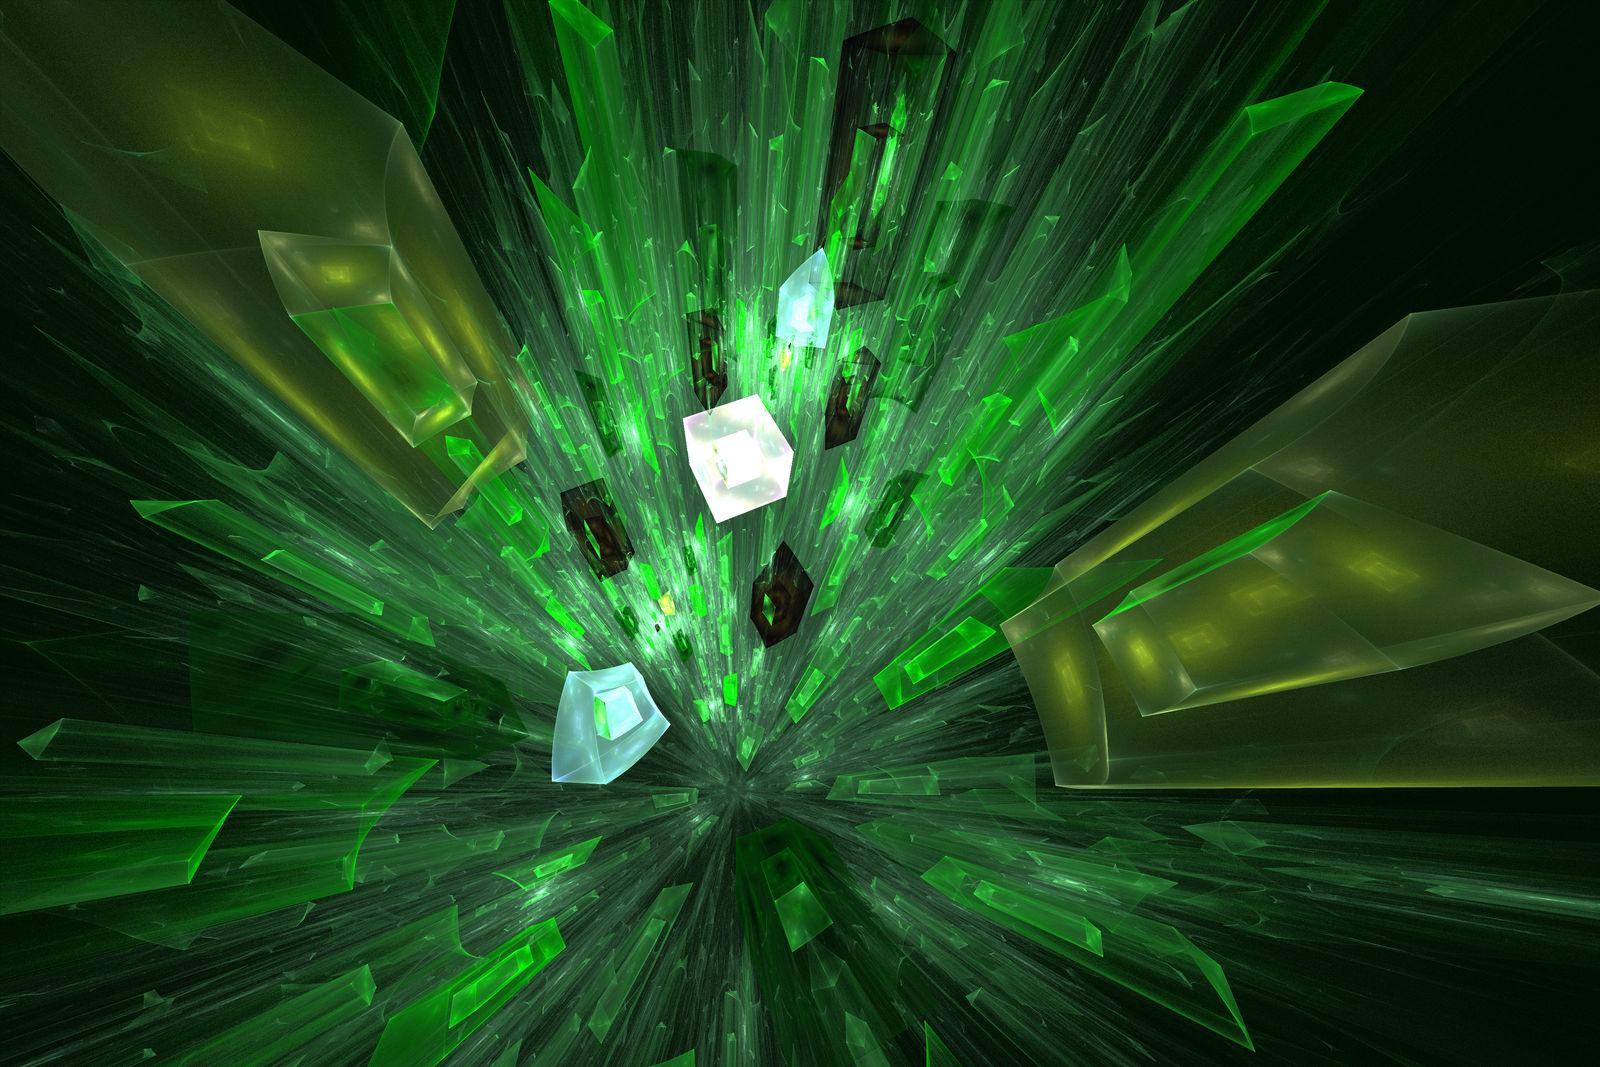 Shattering Green Glass